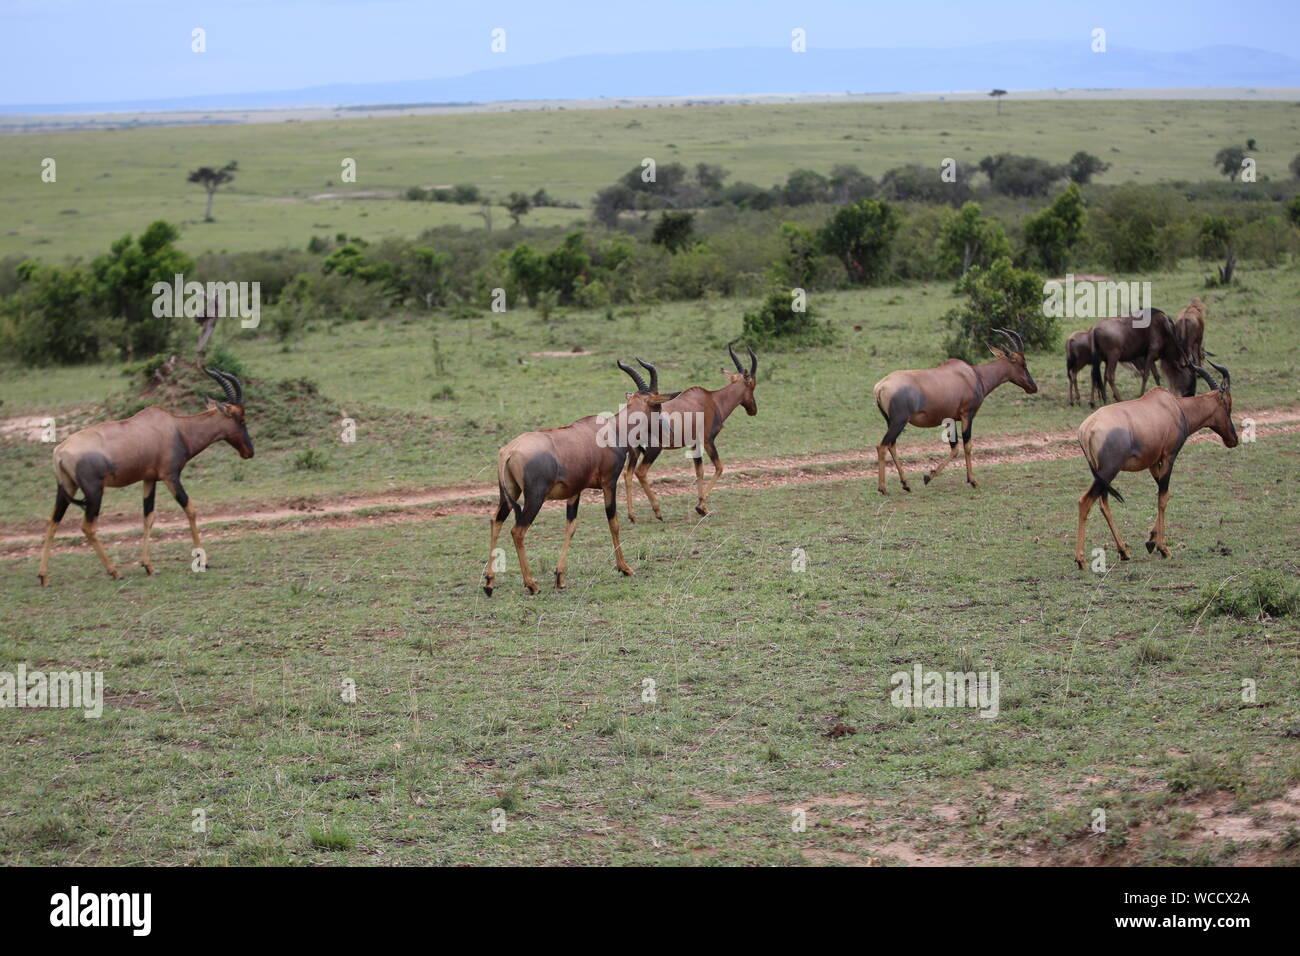 Wildebeests Walking On Grassy Field At Masai Mara Stock Photo